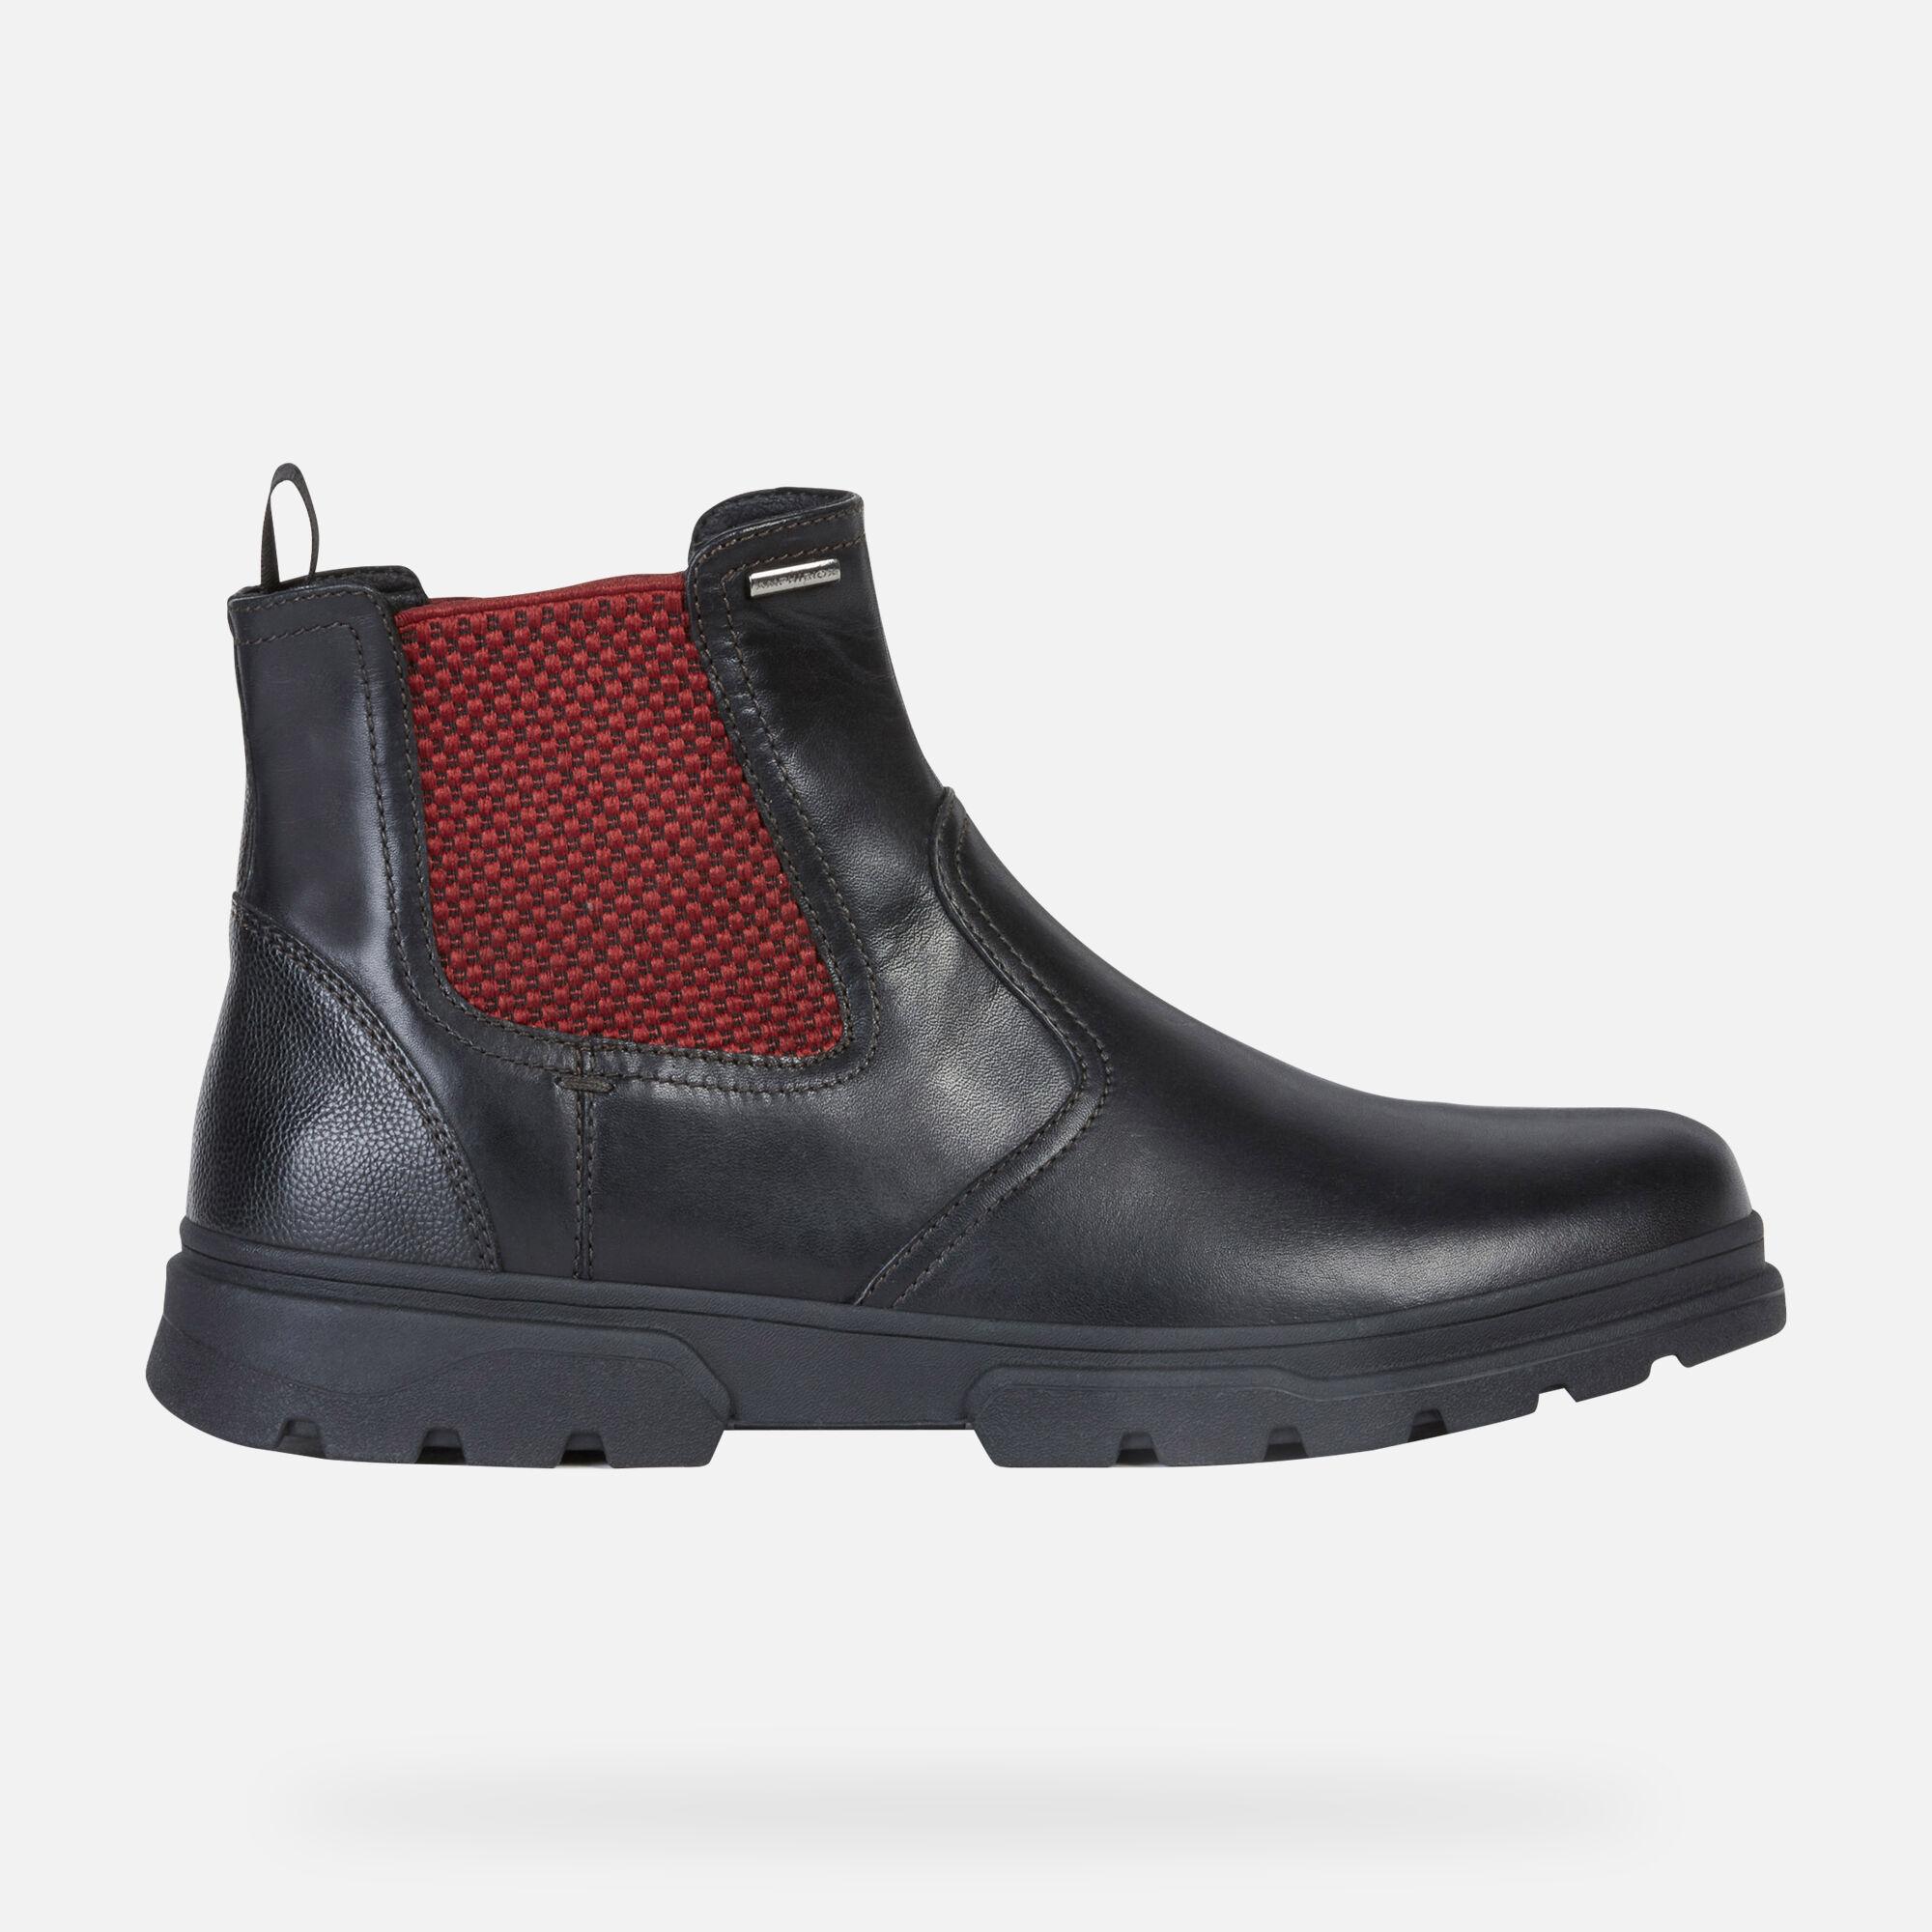 Geox Herren Chelsea Boots kaufen | ZALANDO